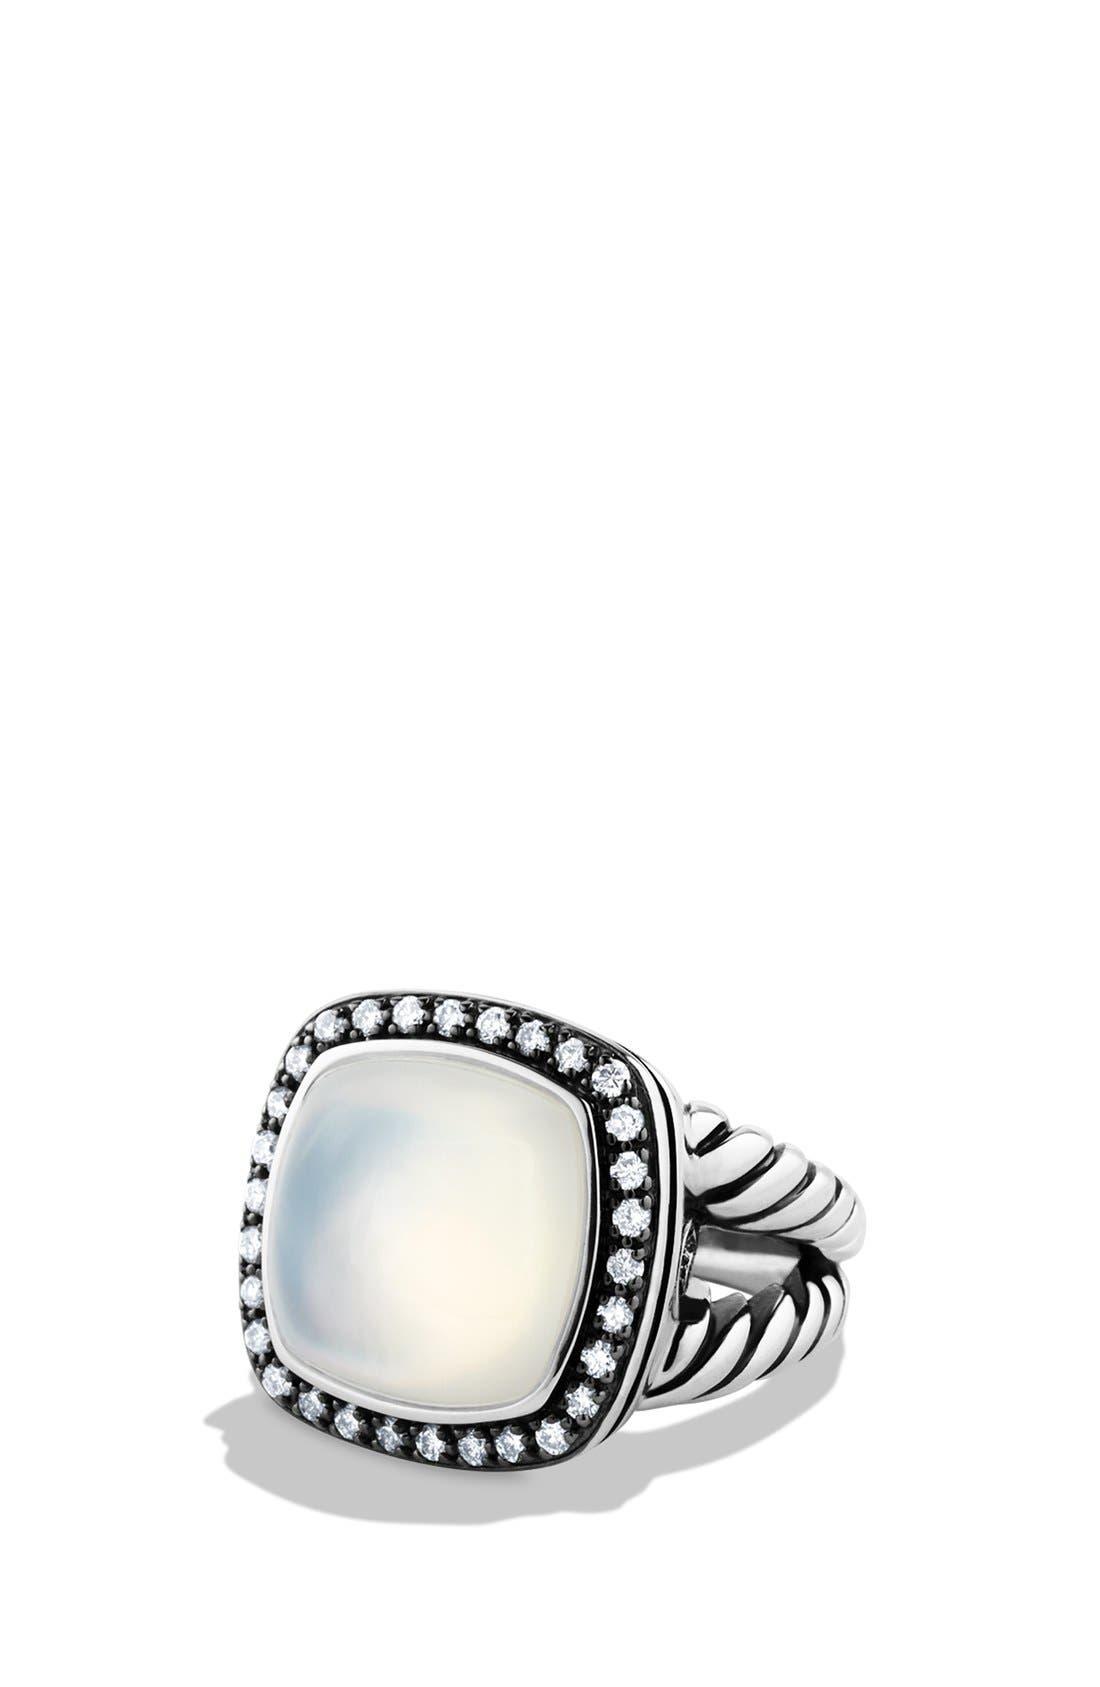 Alternate Image 1 Selected - David Yurman 'Albion' Ring with Semiprecious Stone & Diamonds